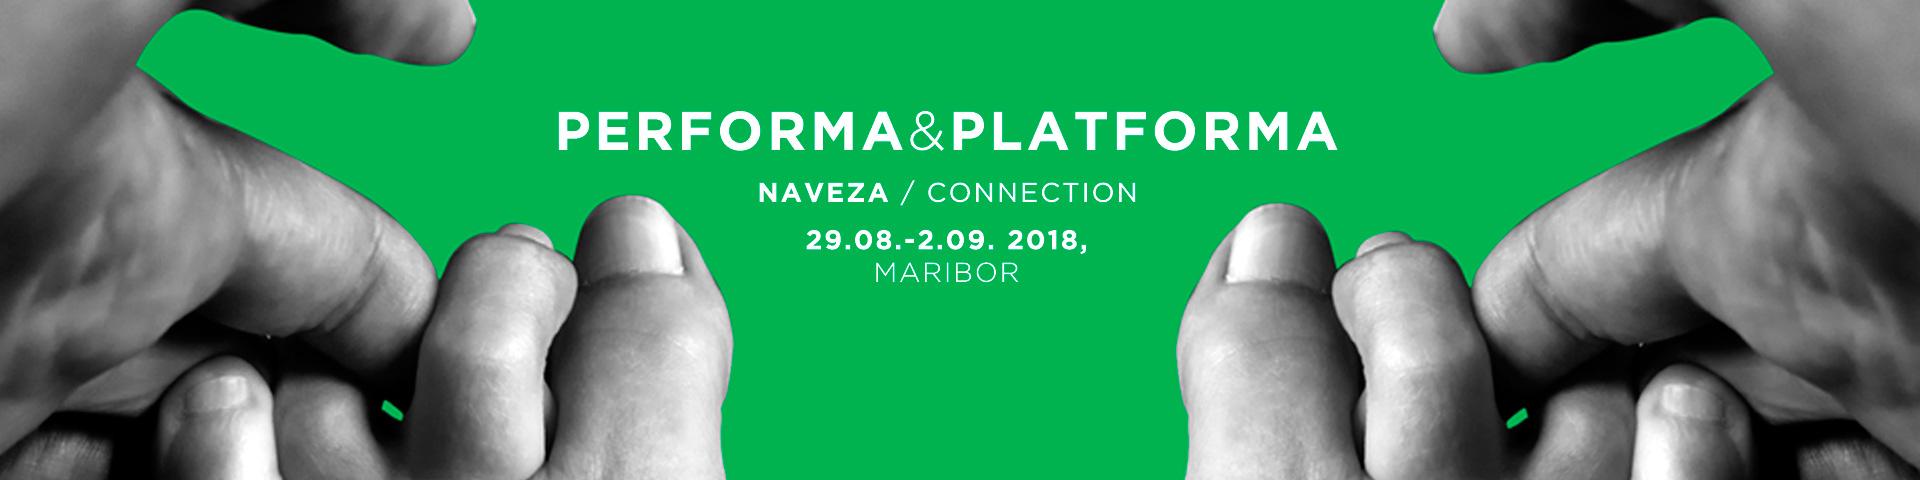 2018-performa-banner-1920x480.jpg